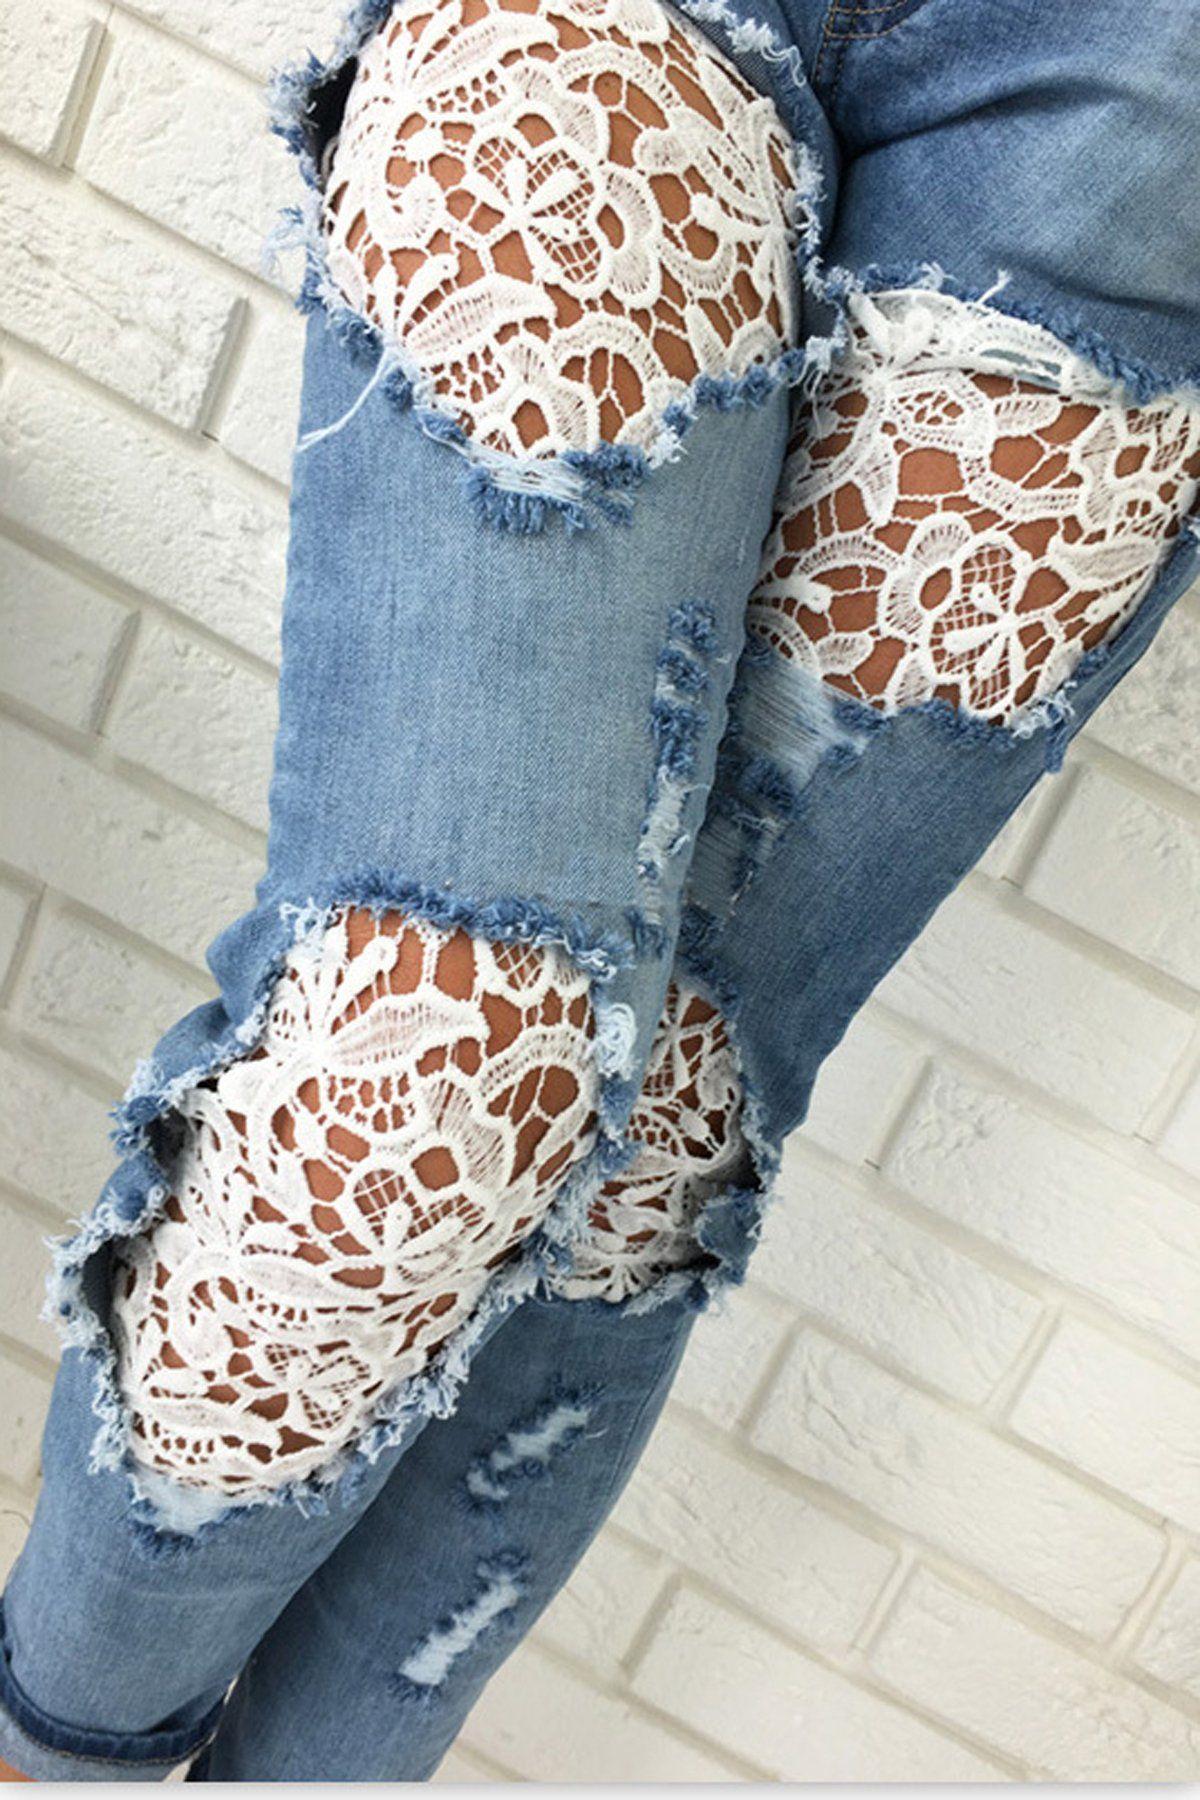 Photo of Lace Denim Patchwork Klipp ut lange mager jeans